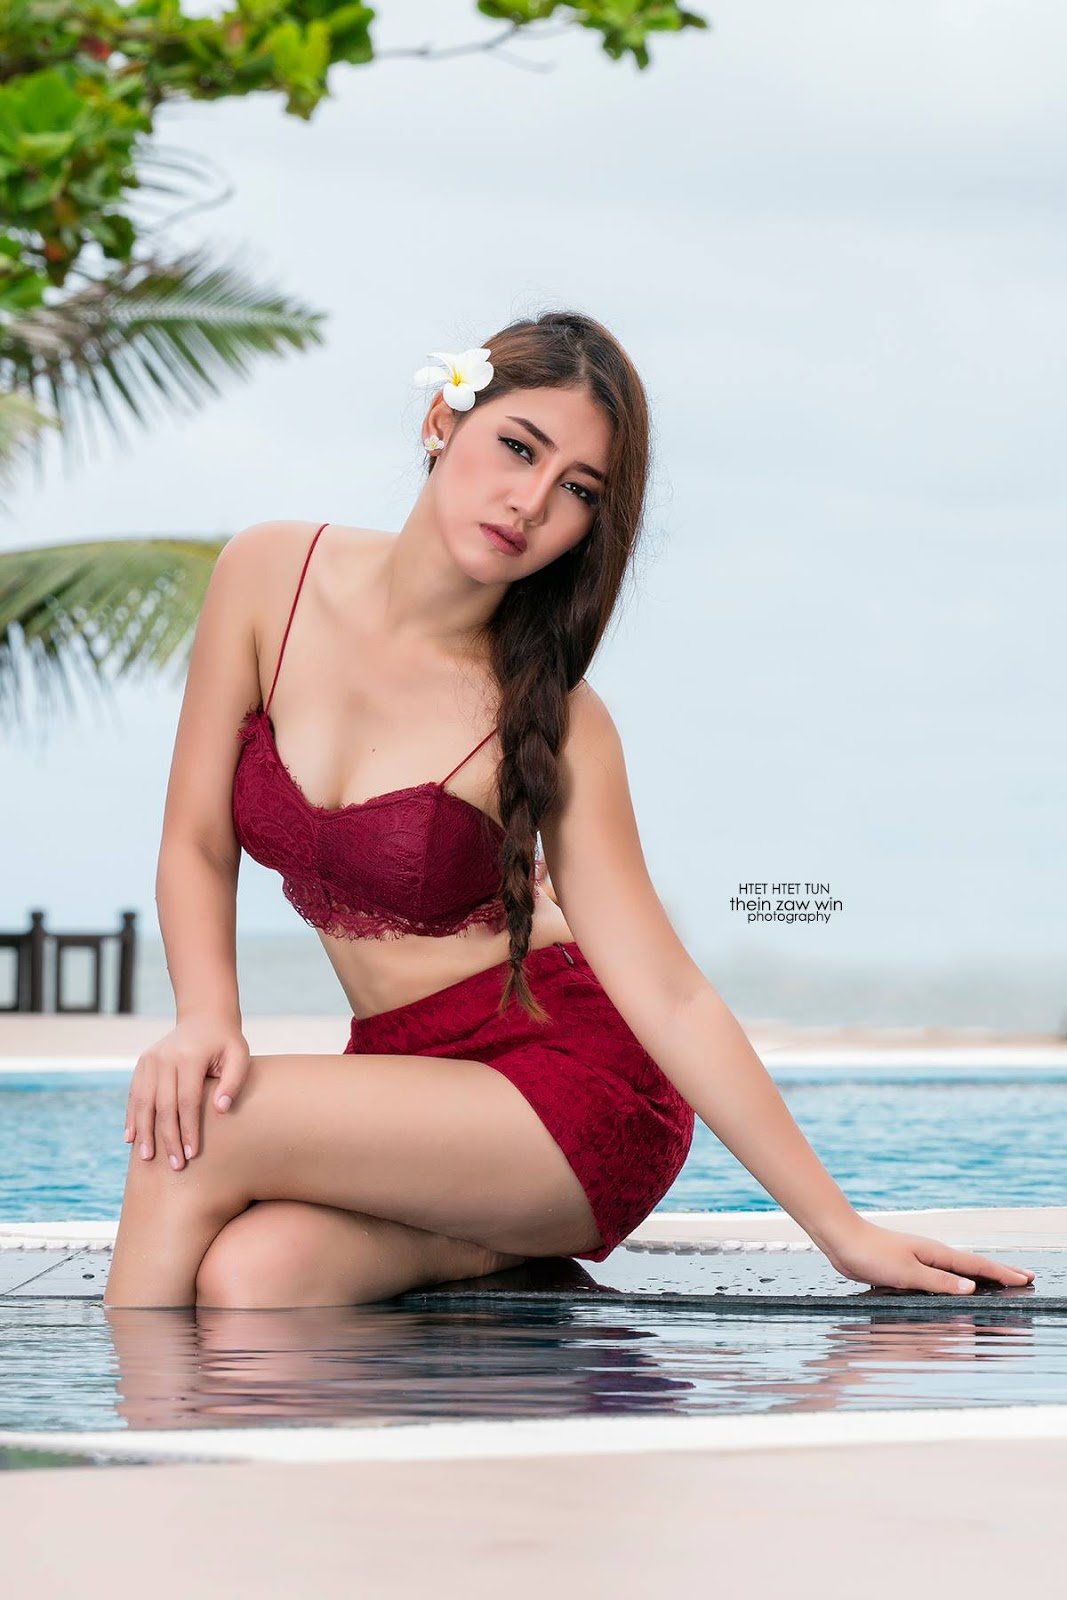 Miss Universe Myanmar 2017 Htet Htet Htun At The Beach